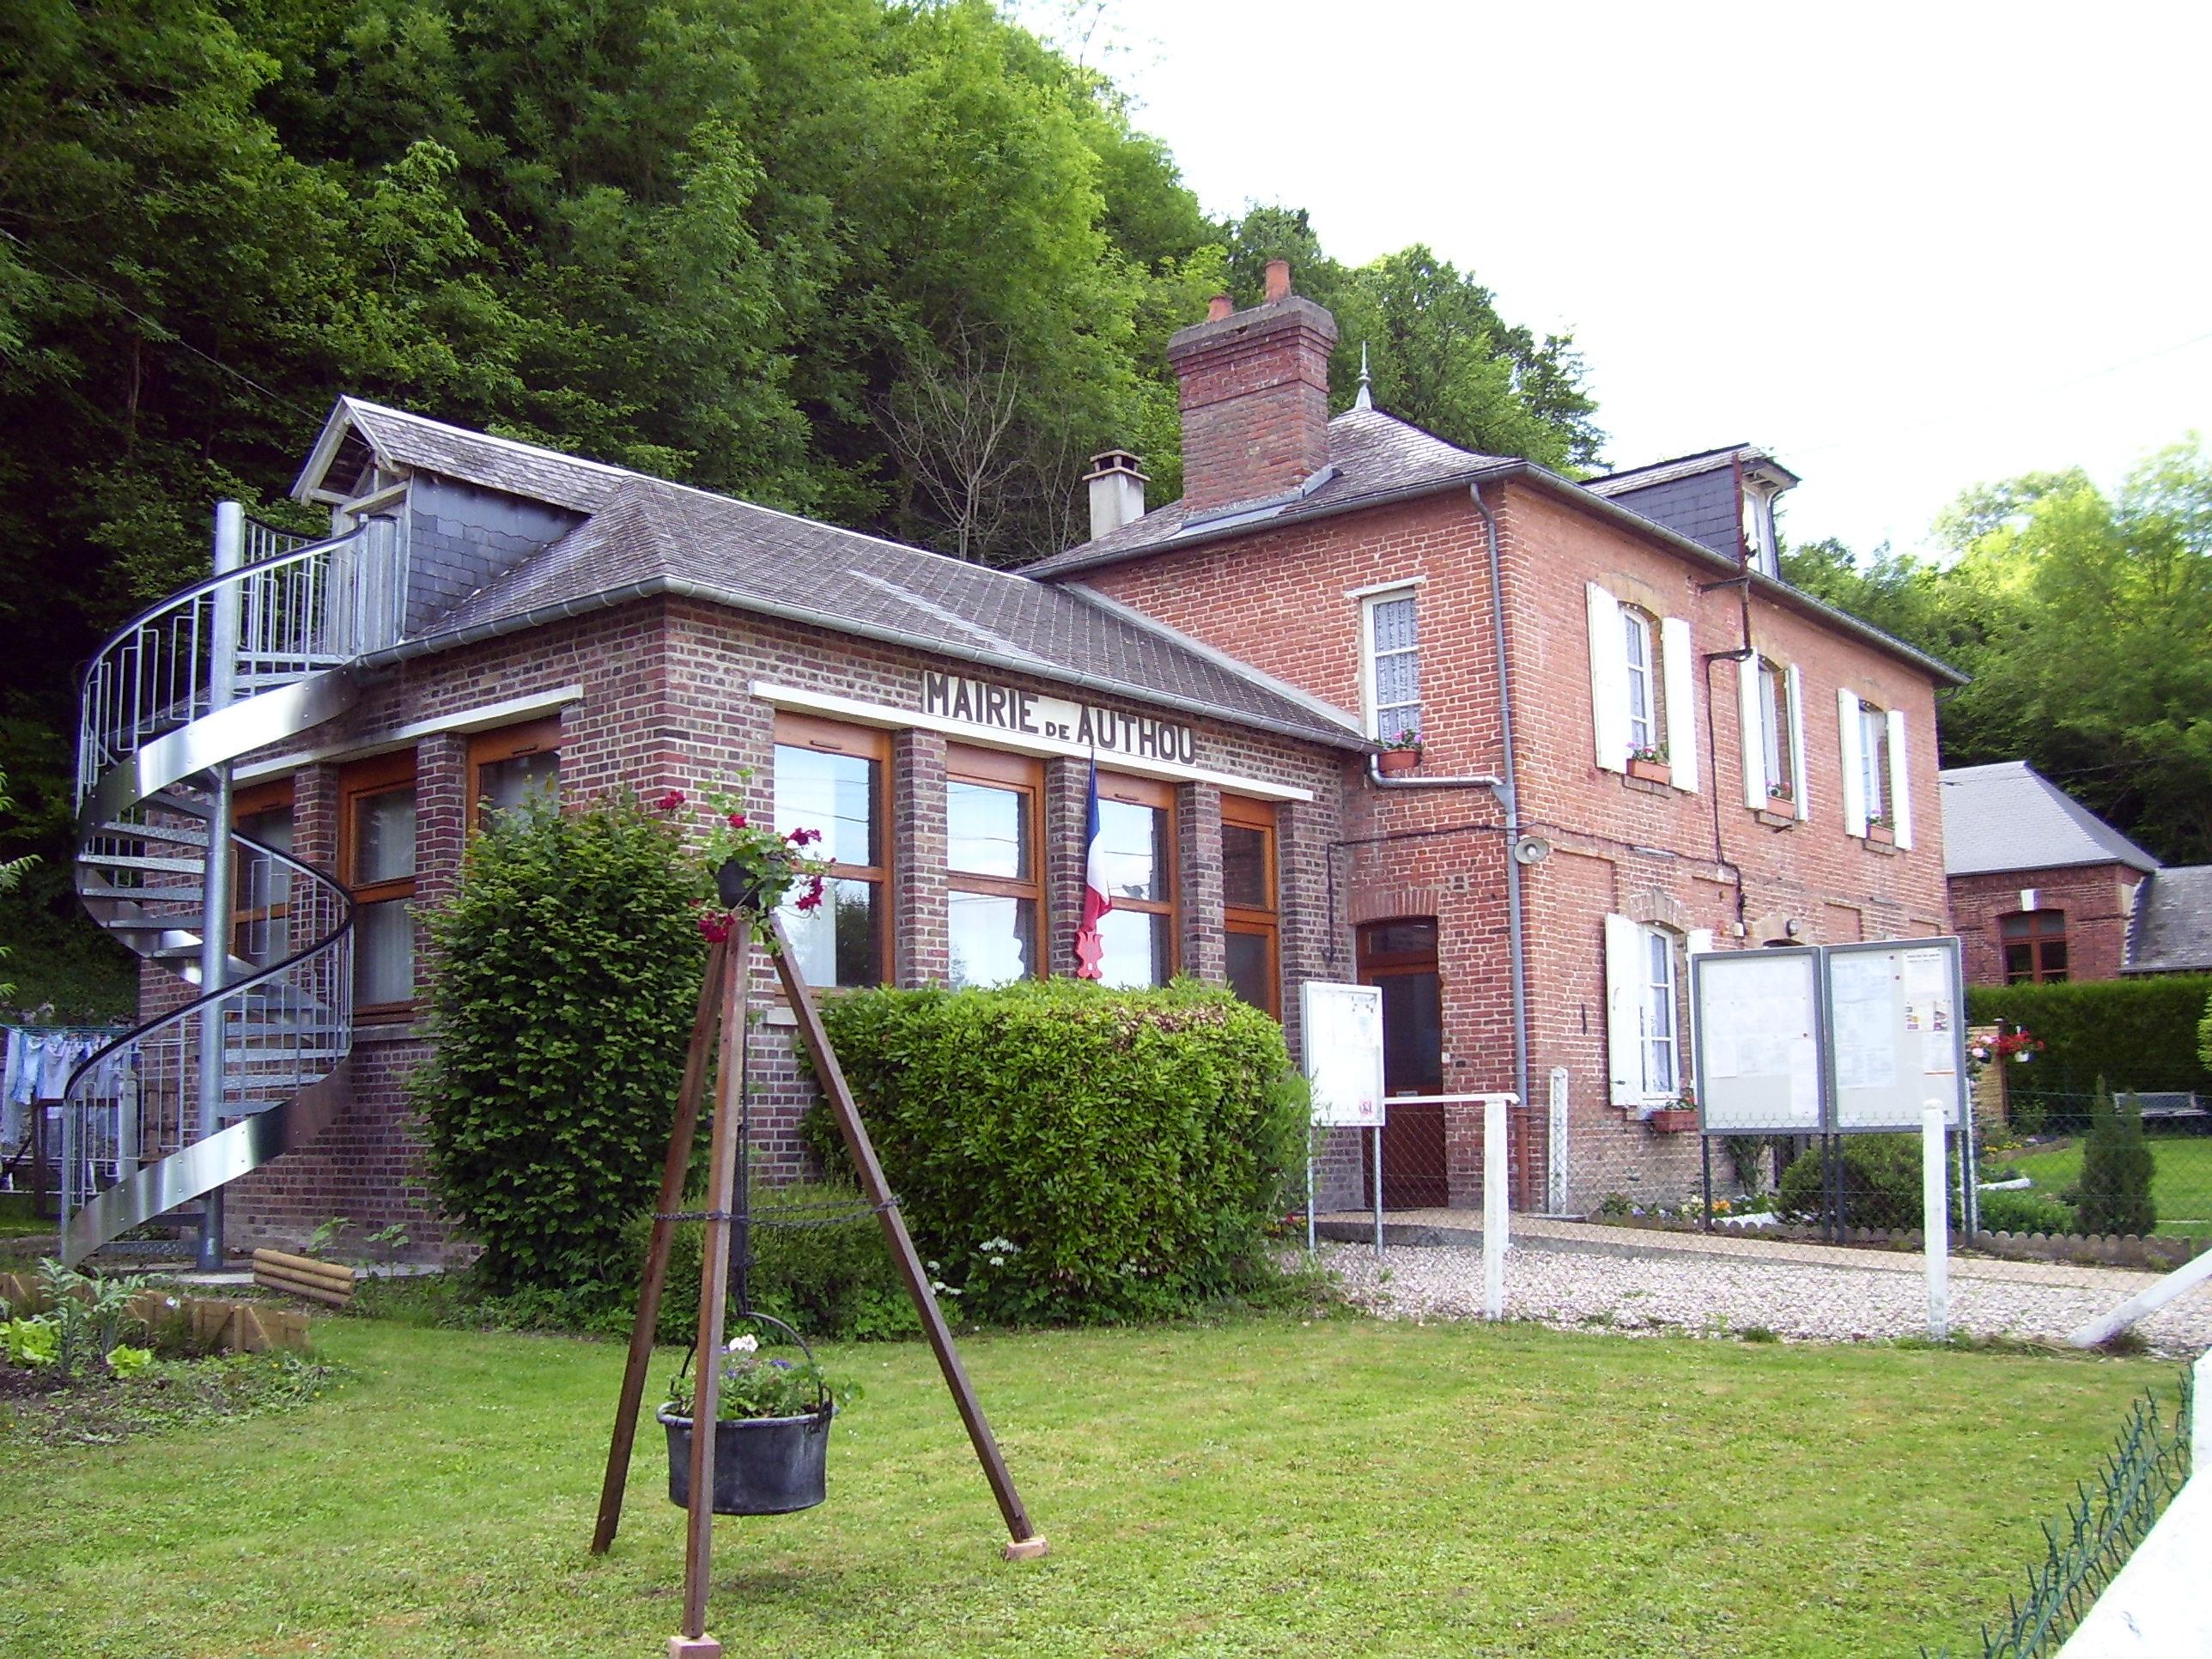 mairie de authou